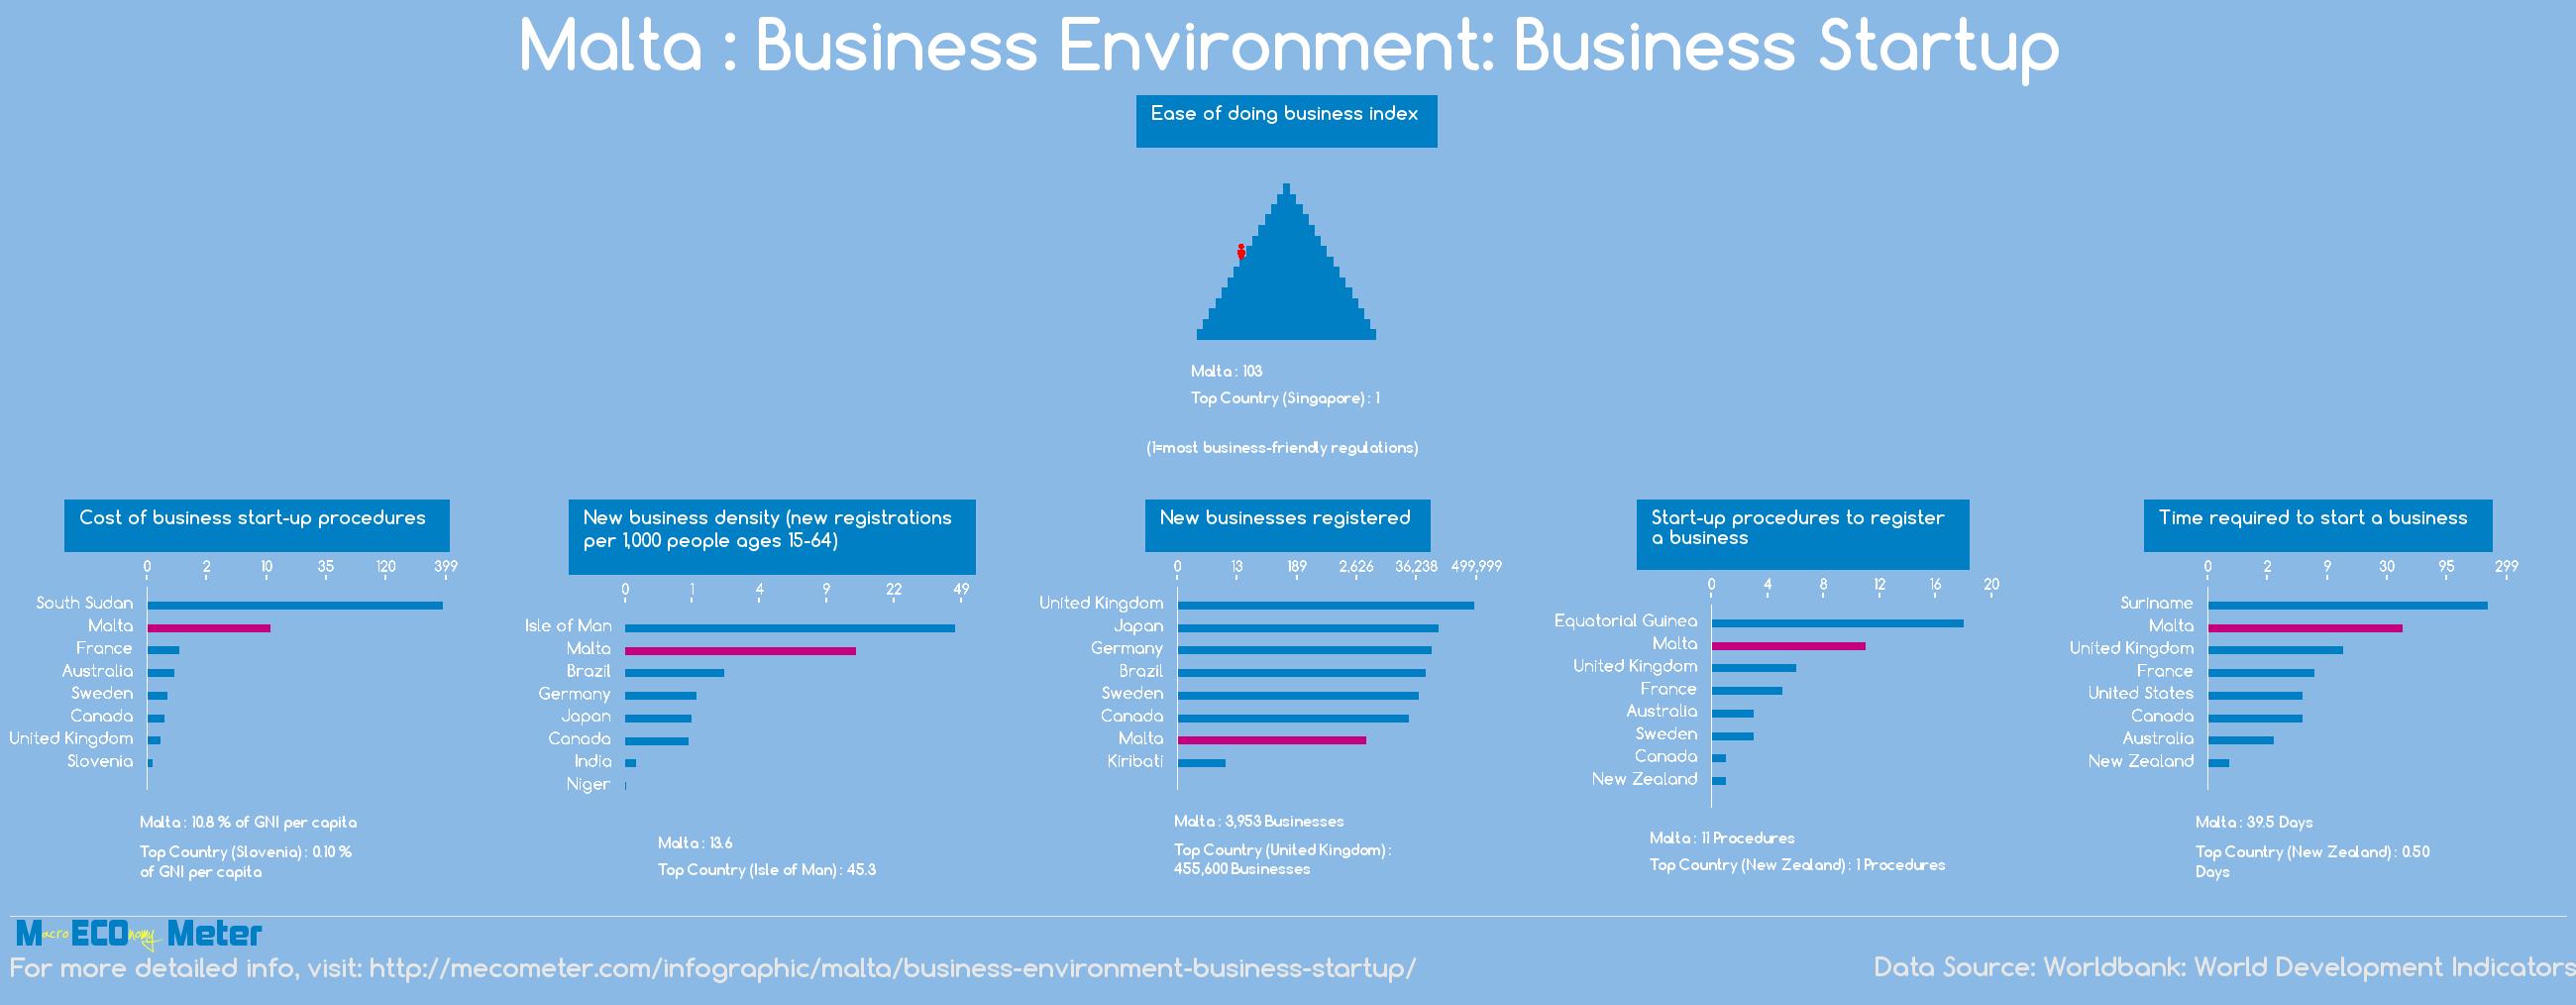 Malta : Business Environment: Business Startup